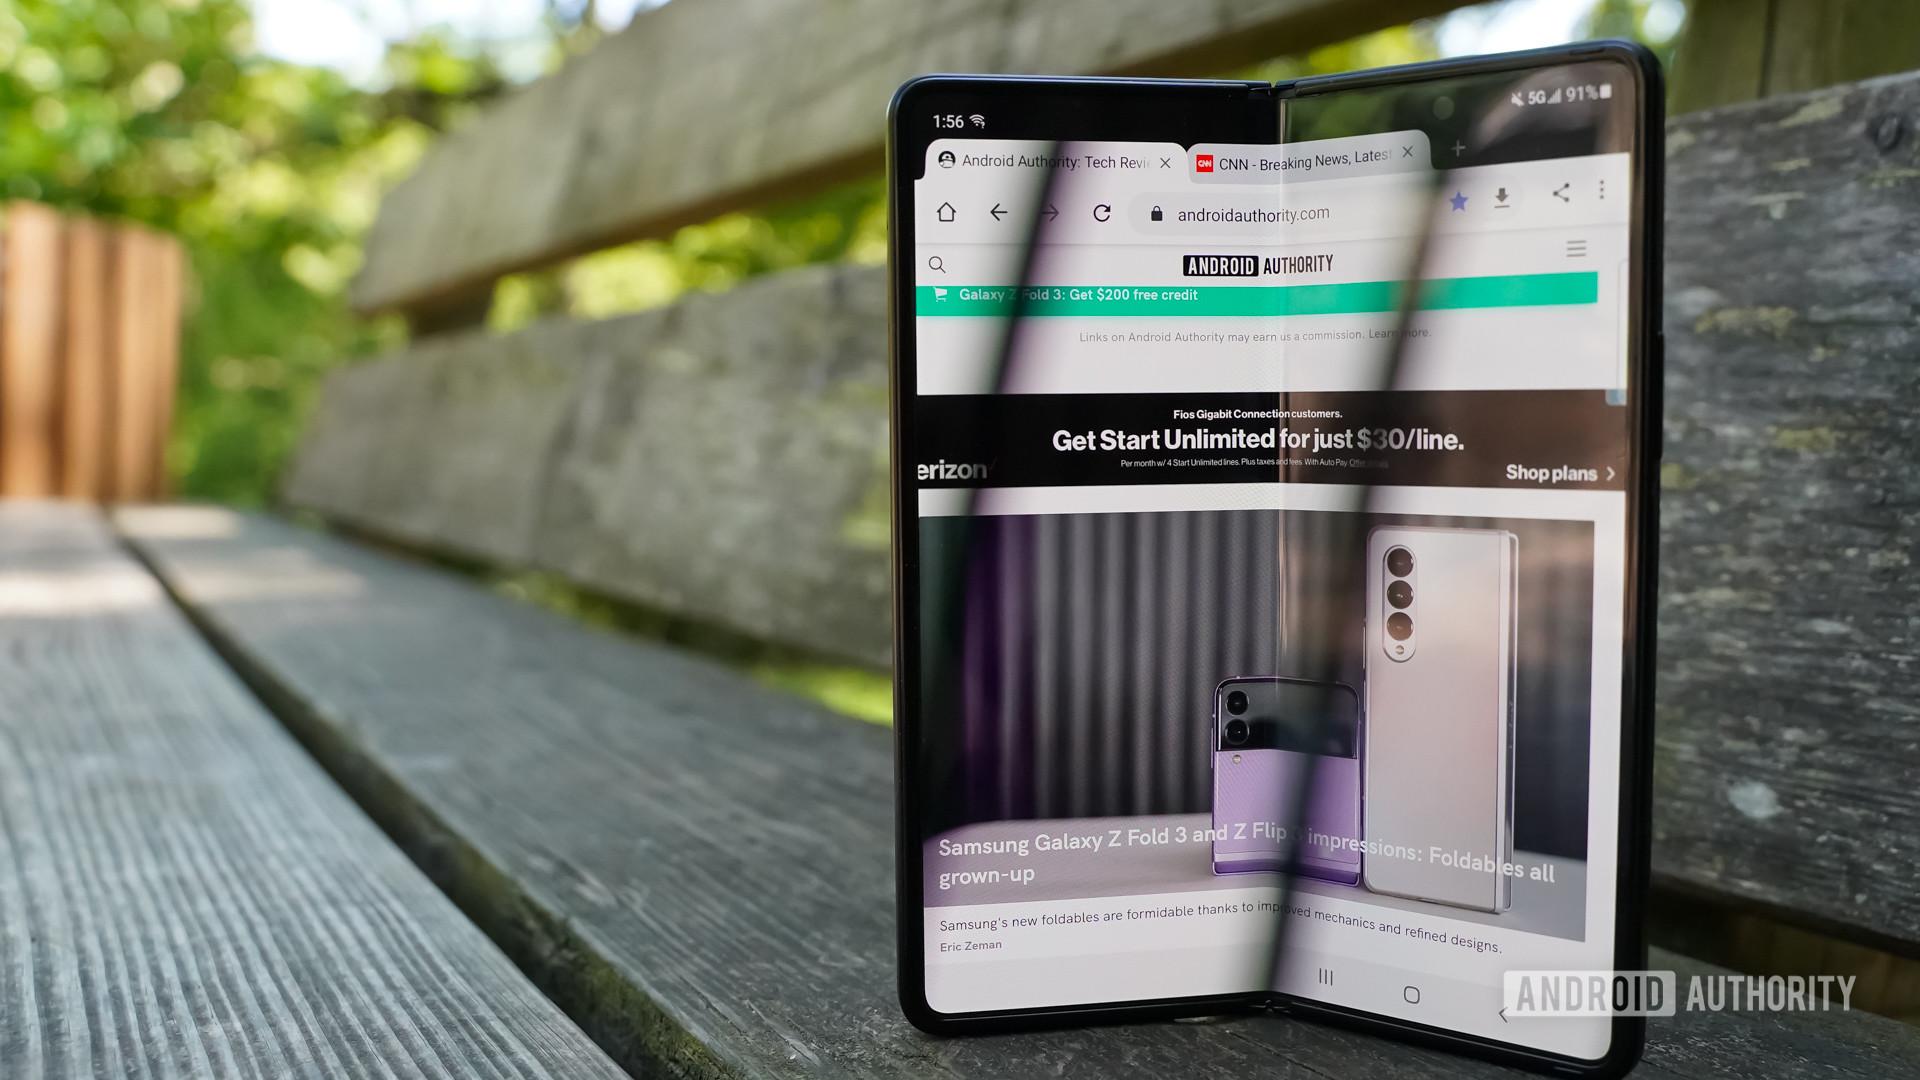 Samsung Galaxy Z Fold 3 open screen bench